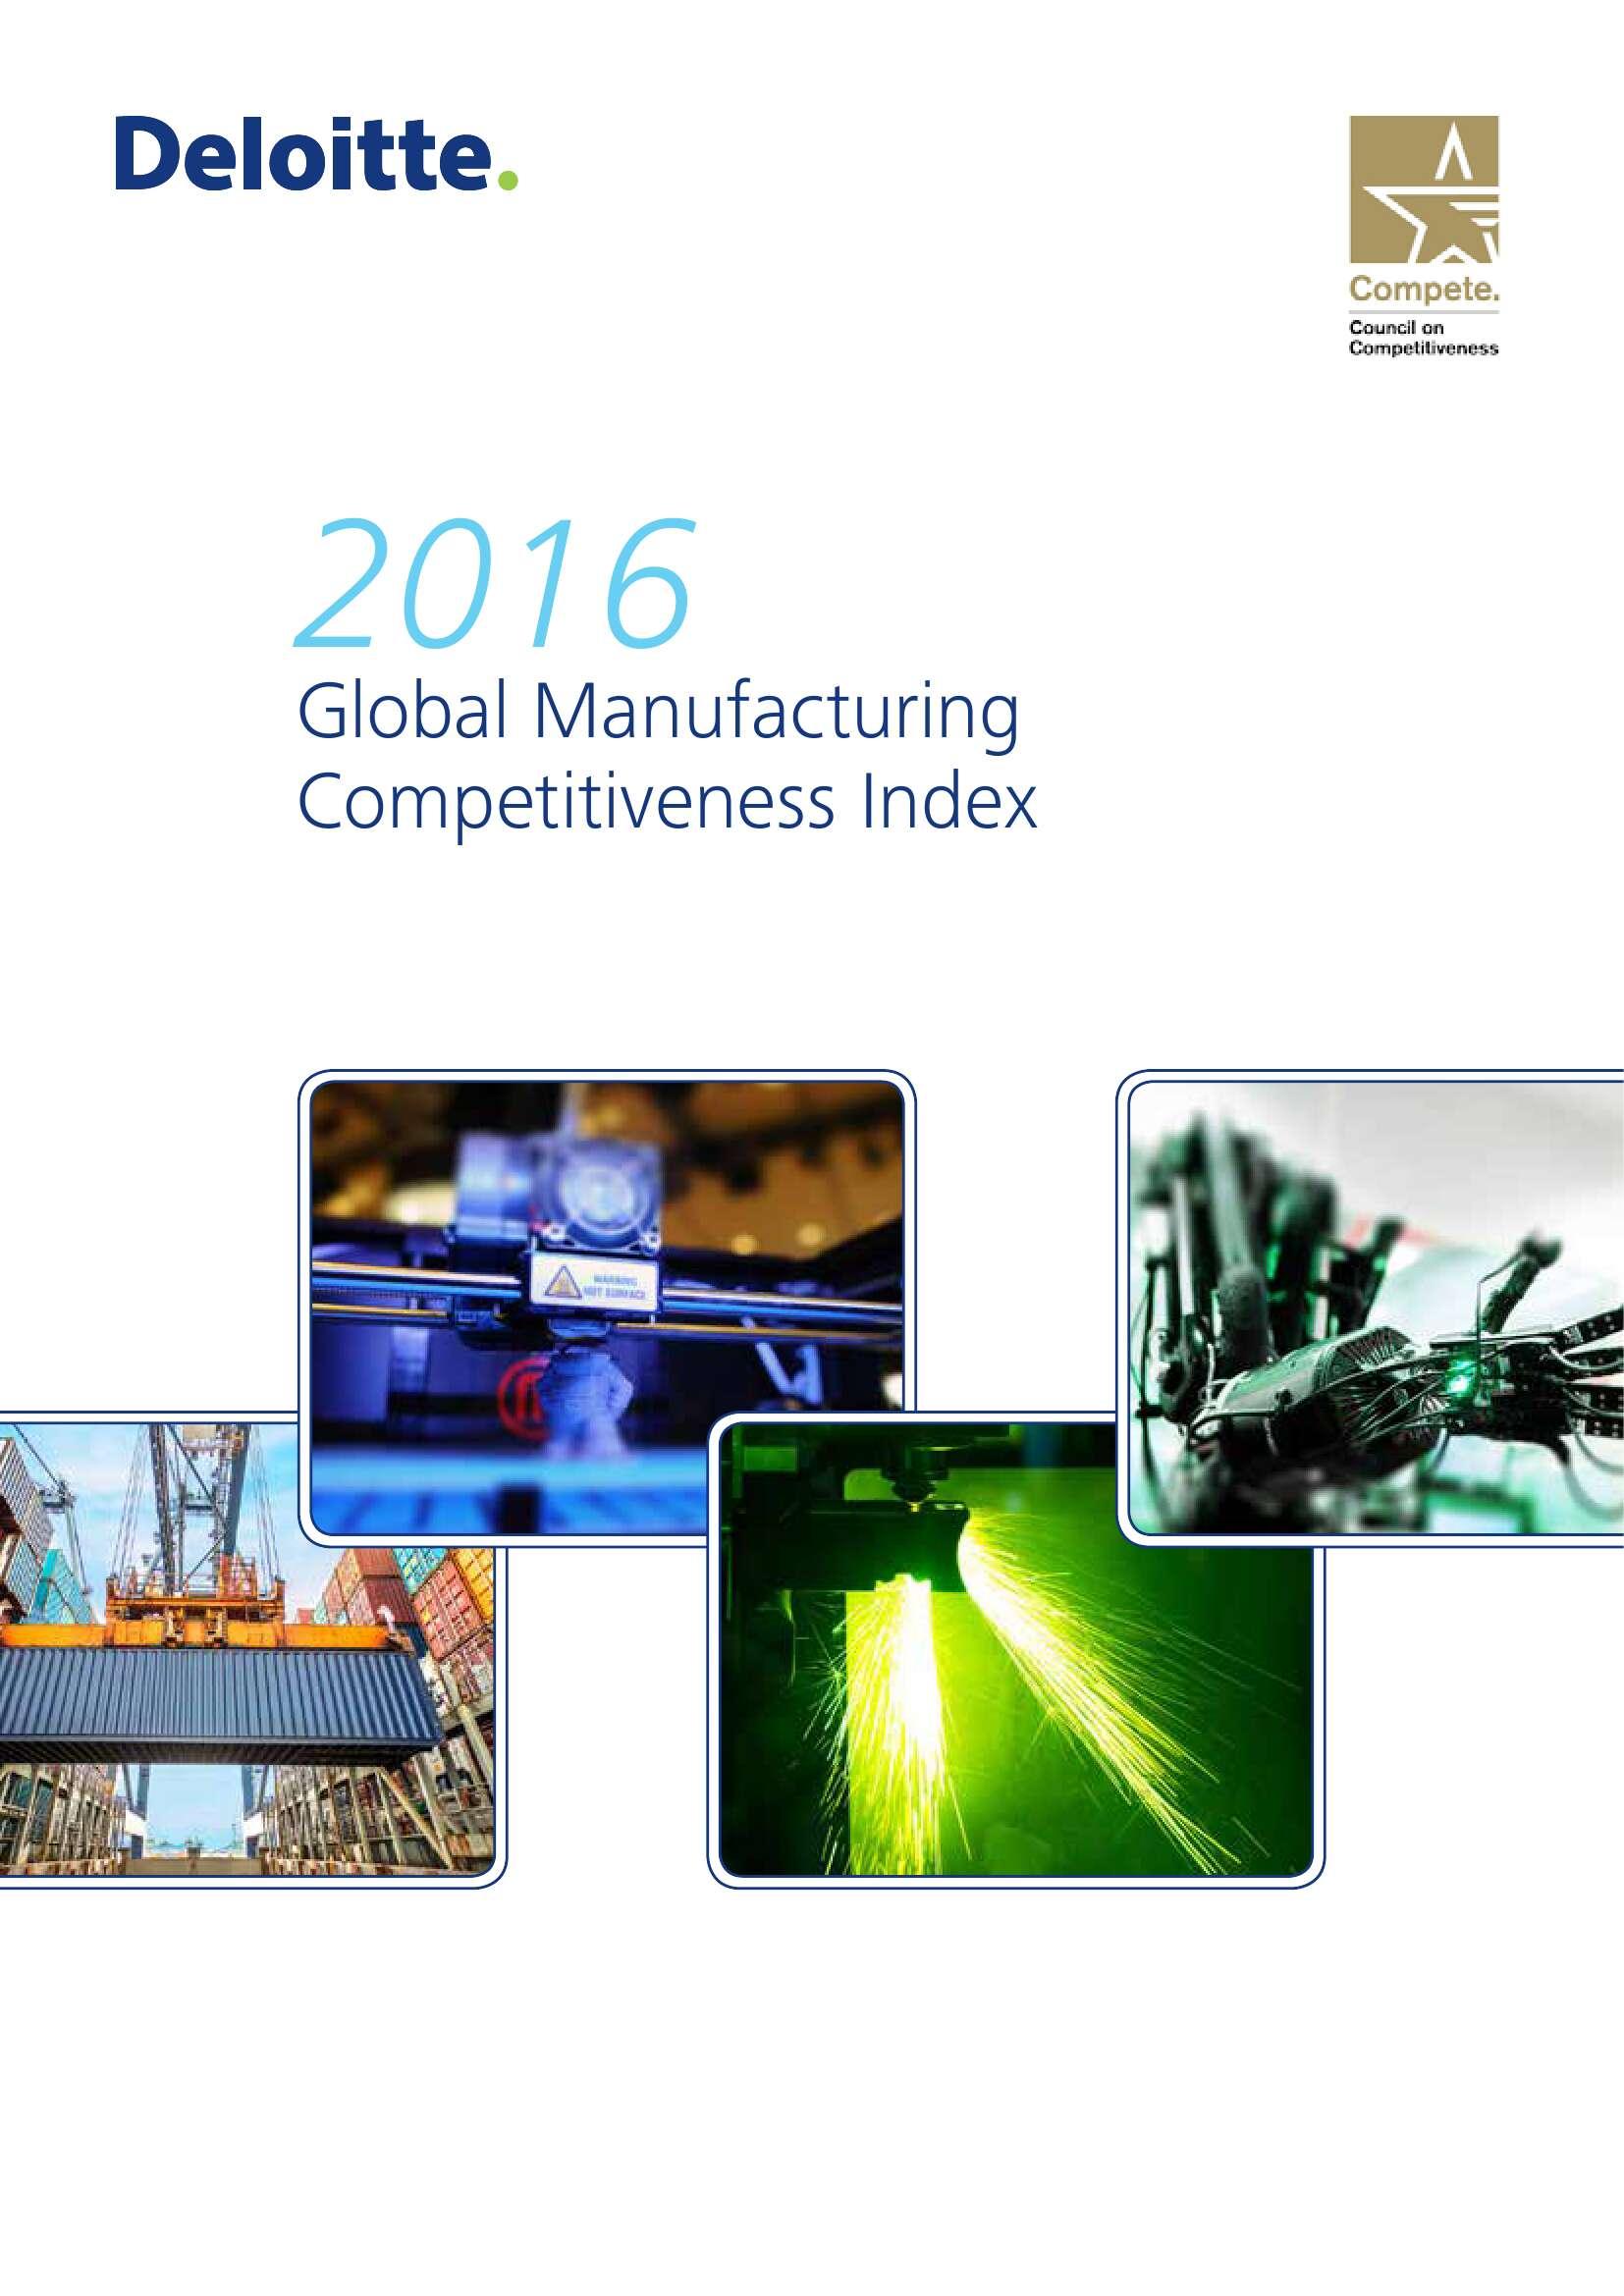 deloitte-cn-global-mfg-competitiveness-index-2016-en-160401_000001